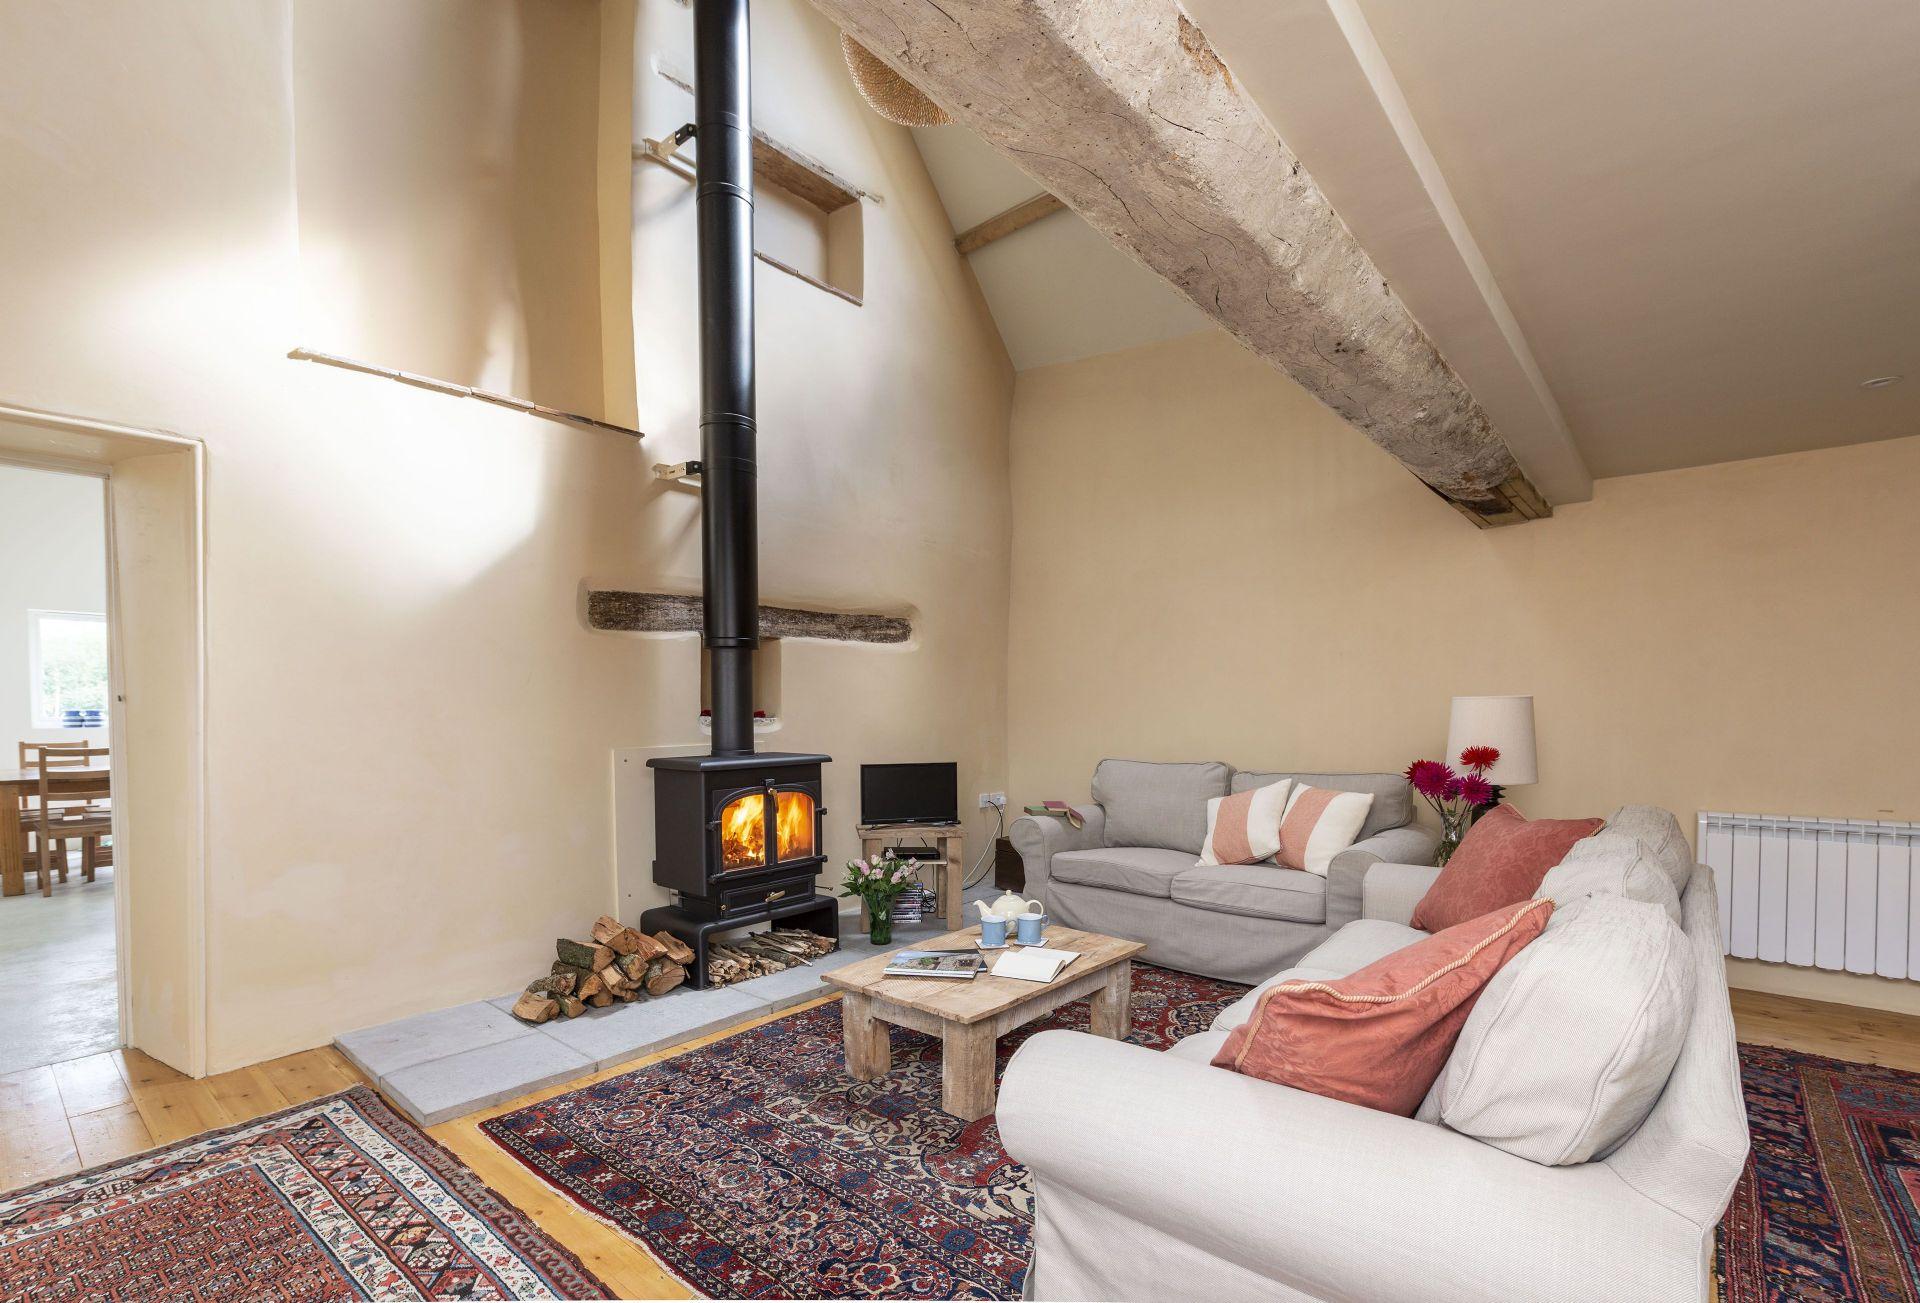 Short Break Holidays - Stable Cottage at Draycott